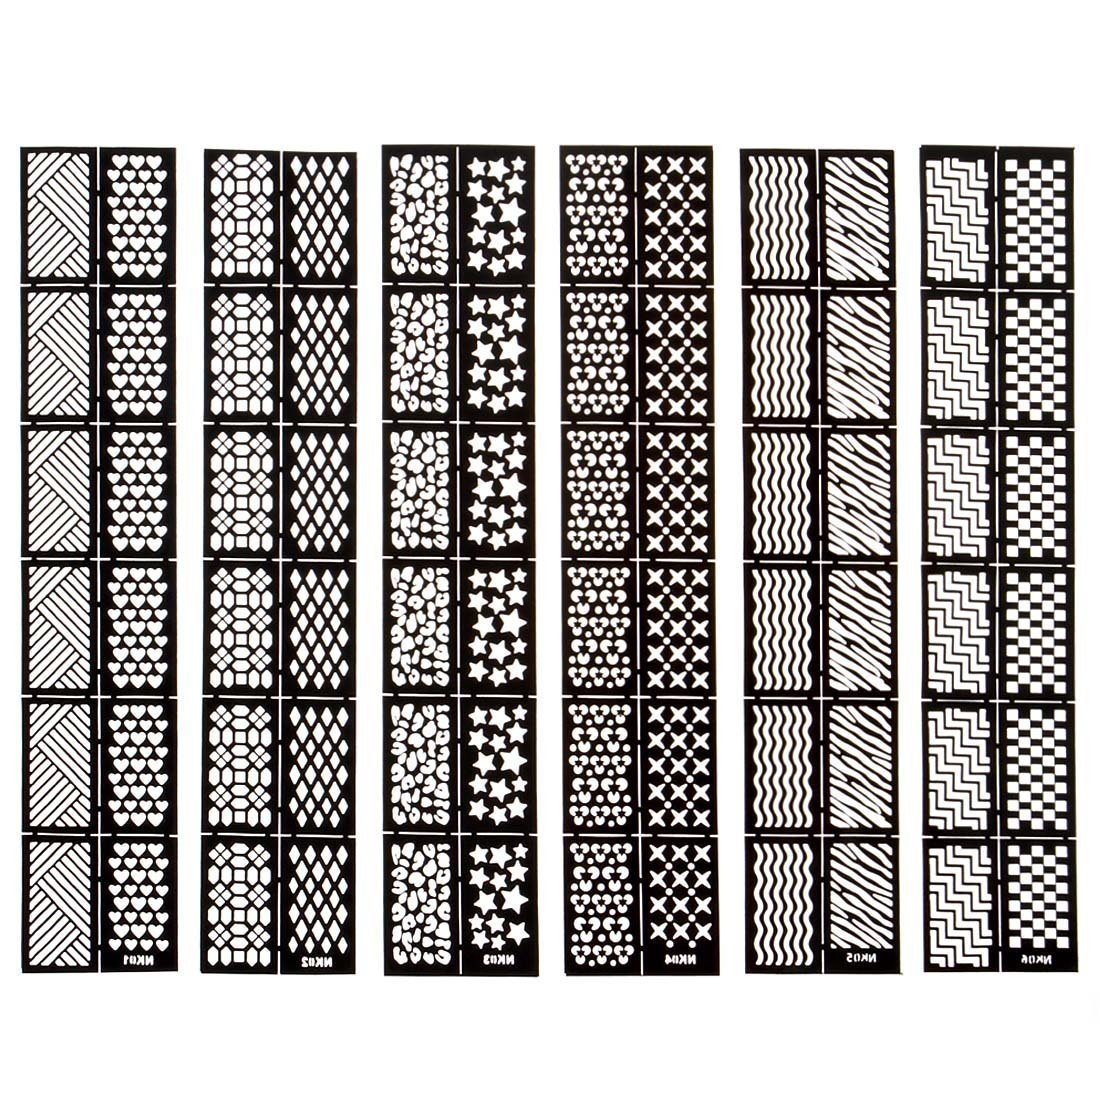 Amazon.com : EFT 12 Tips/Sheet Nail Vinyls Easy Use Nail Art ...